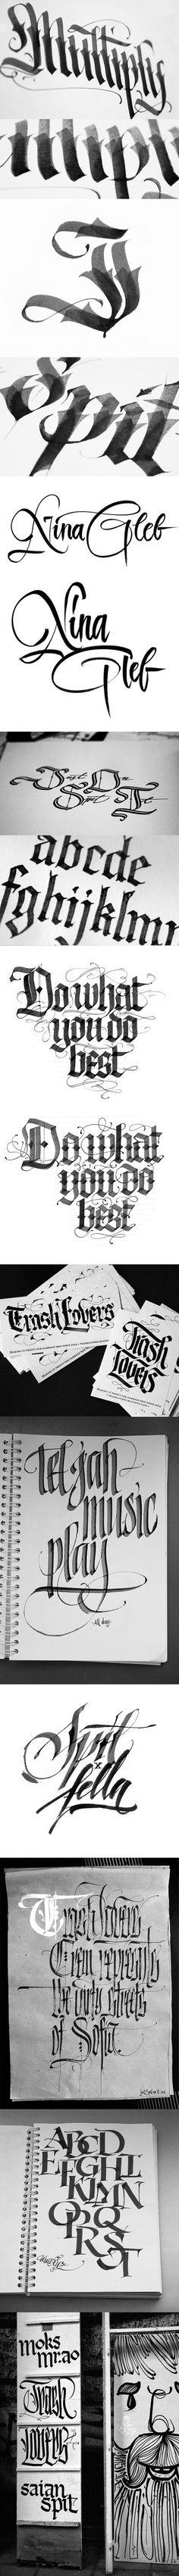 Calligraphy (mostly fraktur) holy moley